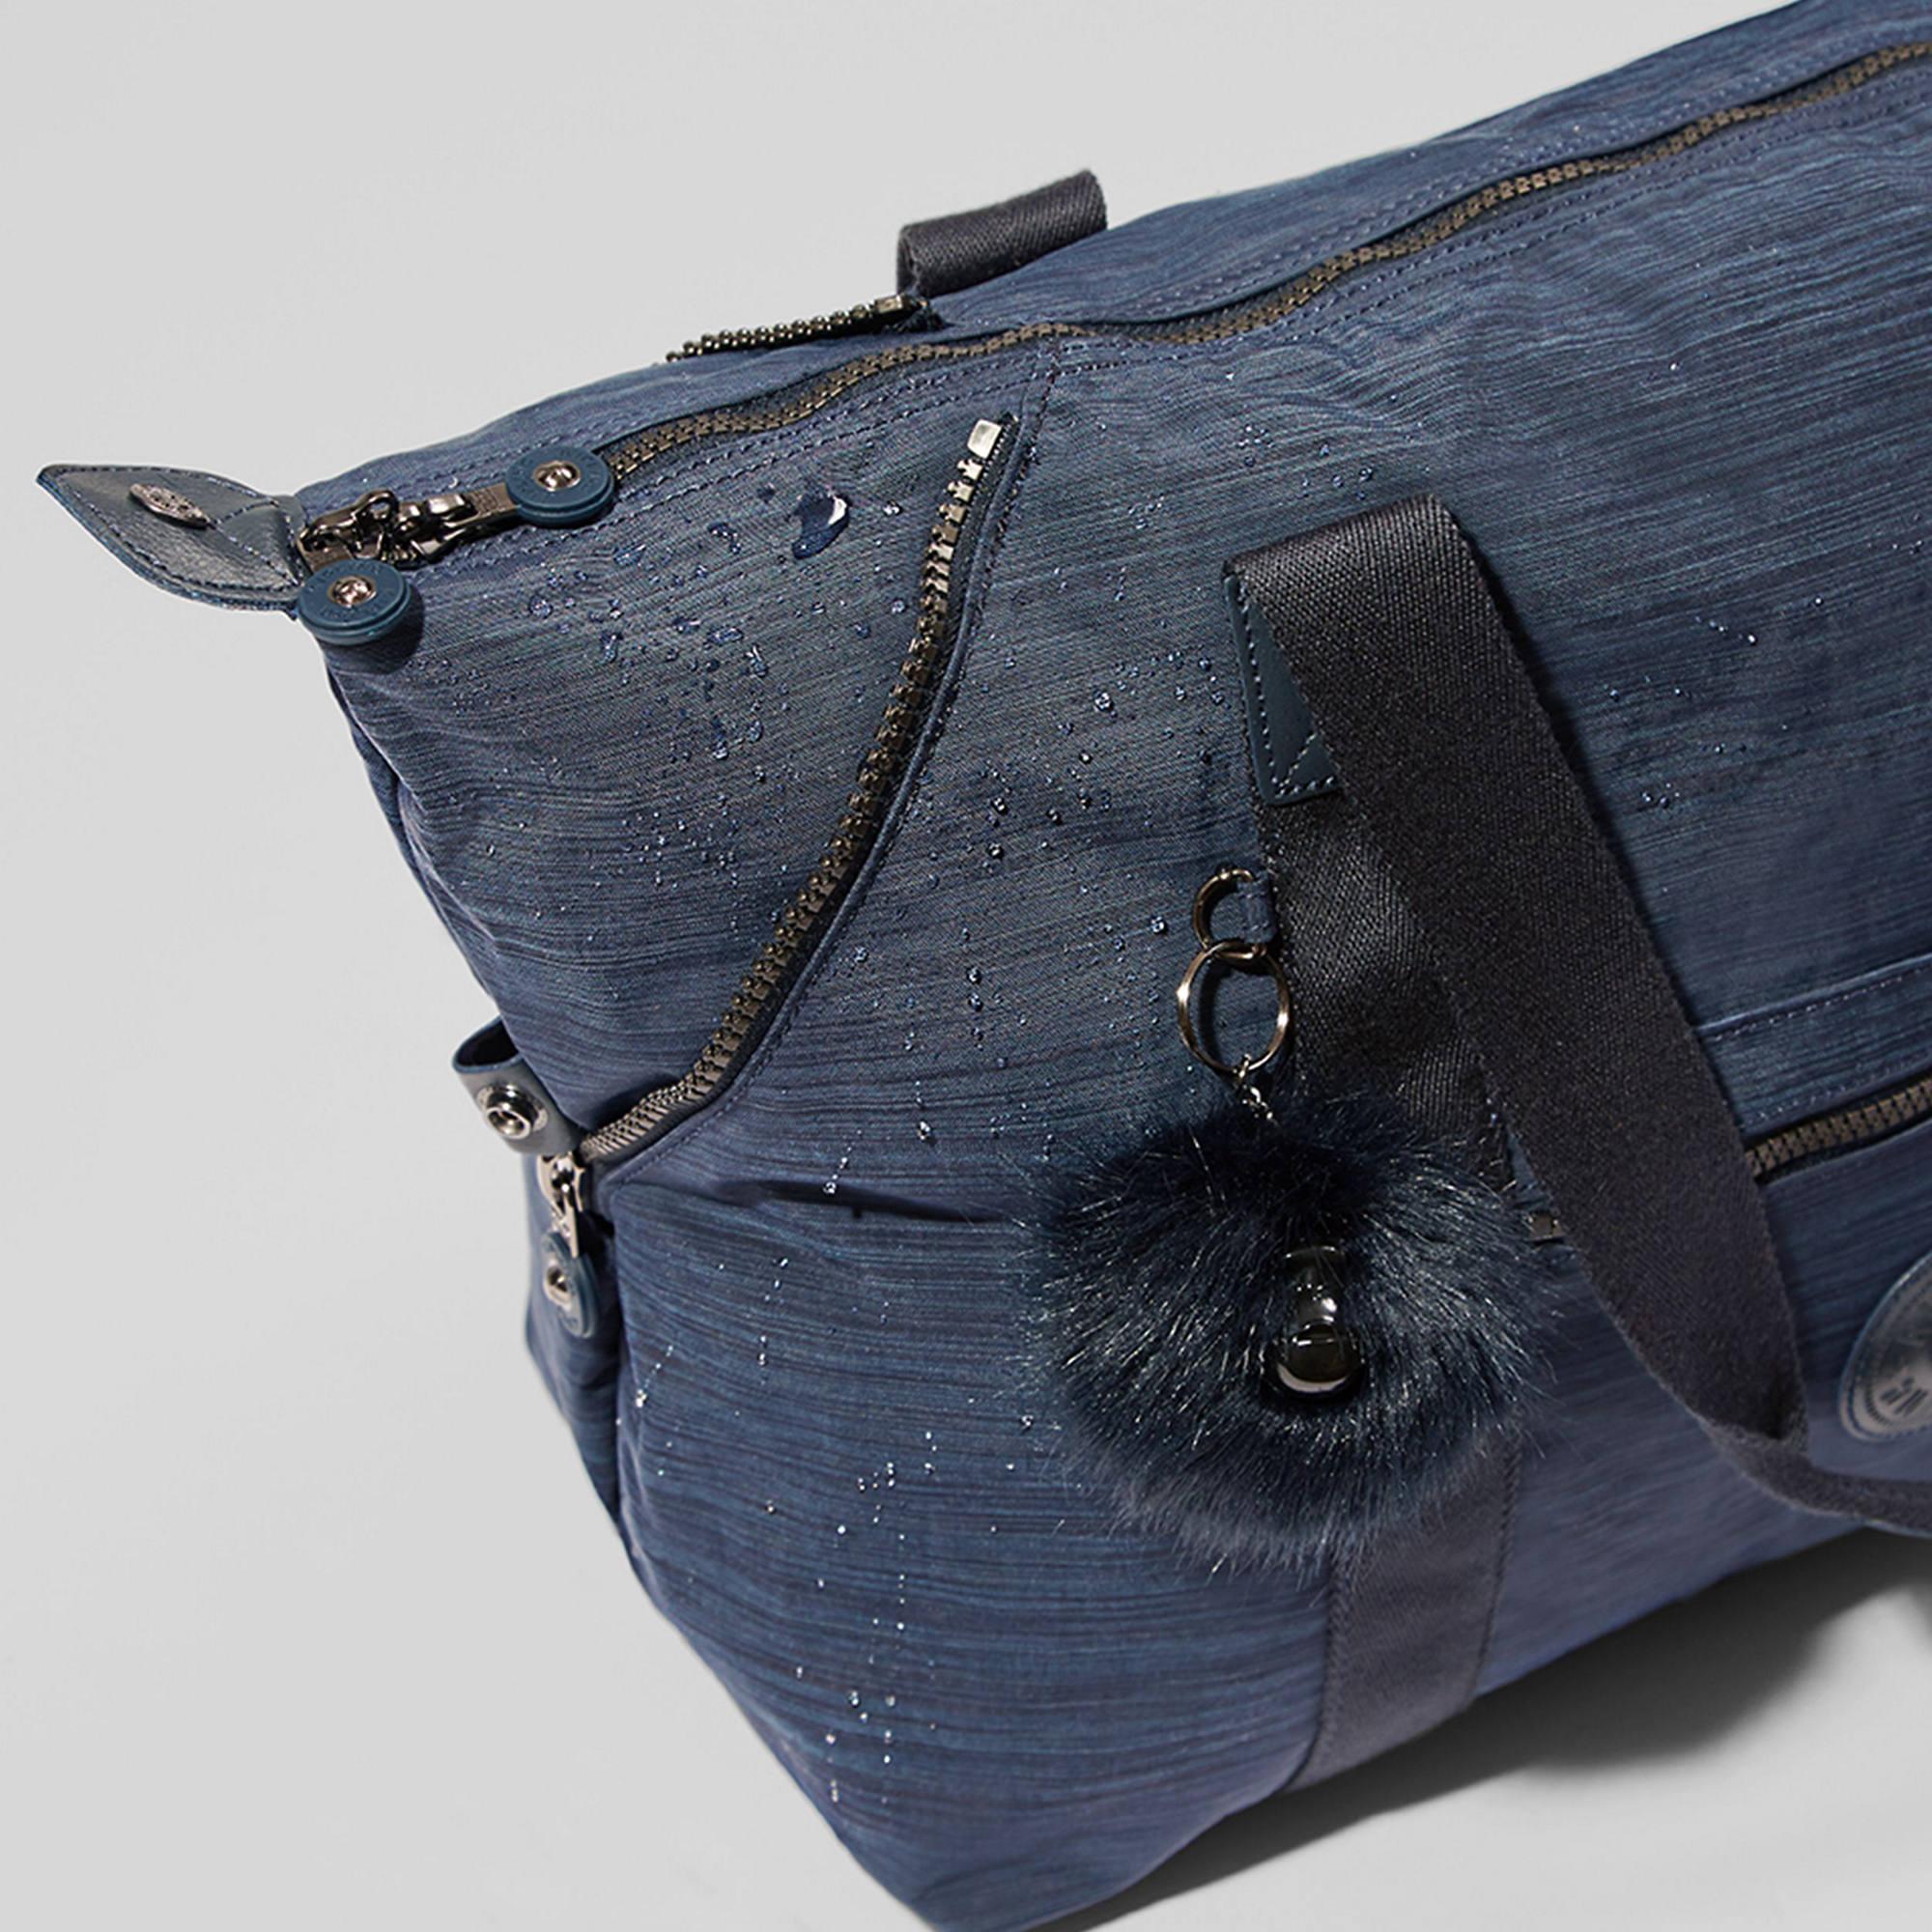 447275c8d6 Art Medium Tote Bag,True Dazz Navy,large